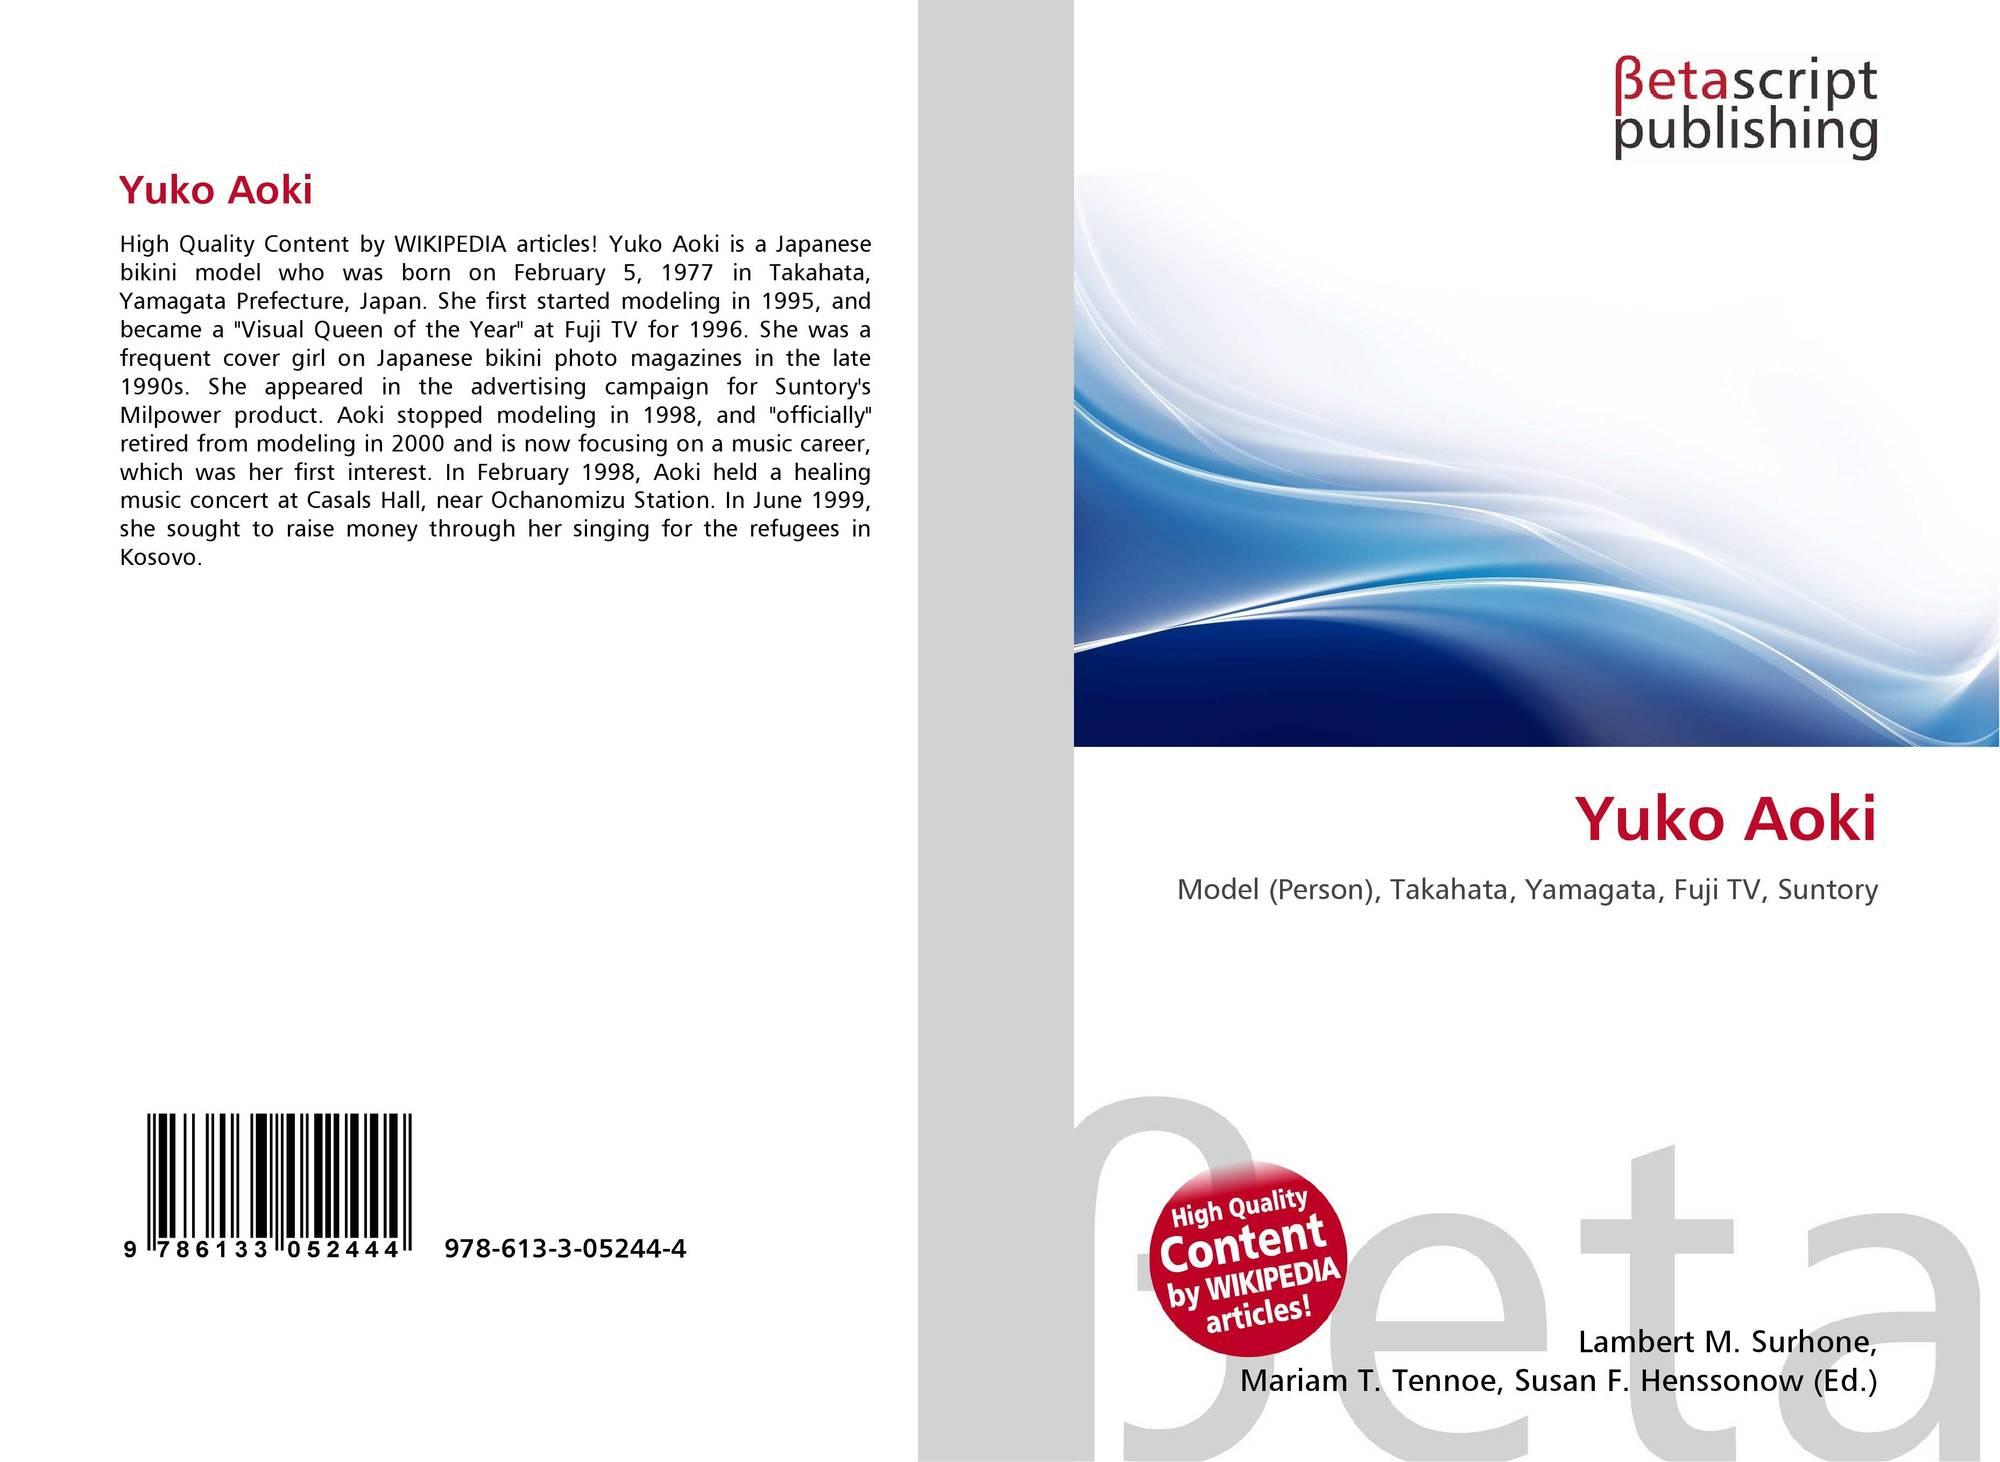 Communication on this topic: Lucie Zednickova, yuko-aoki-1990s/